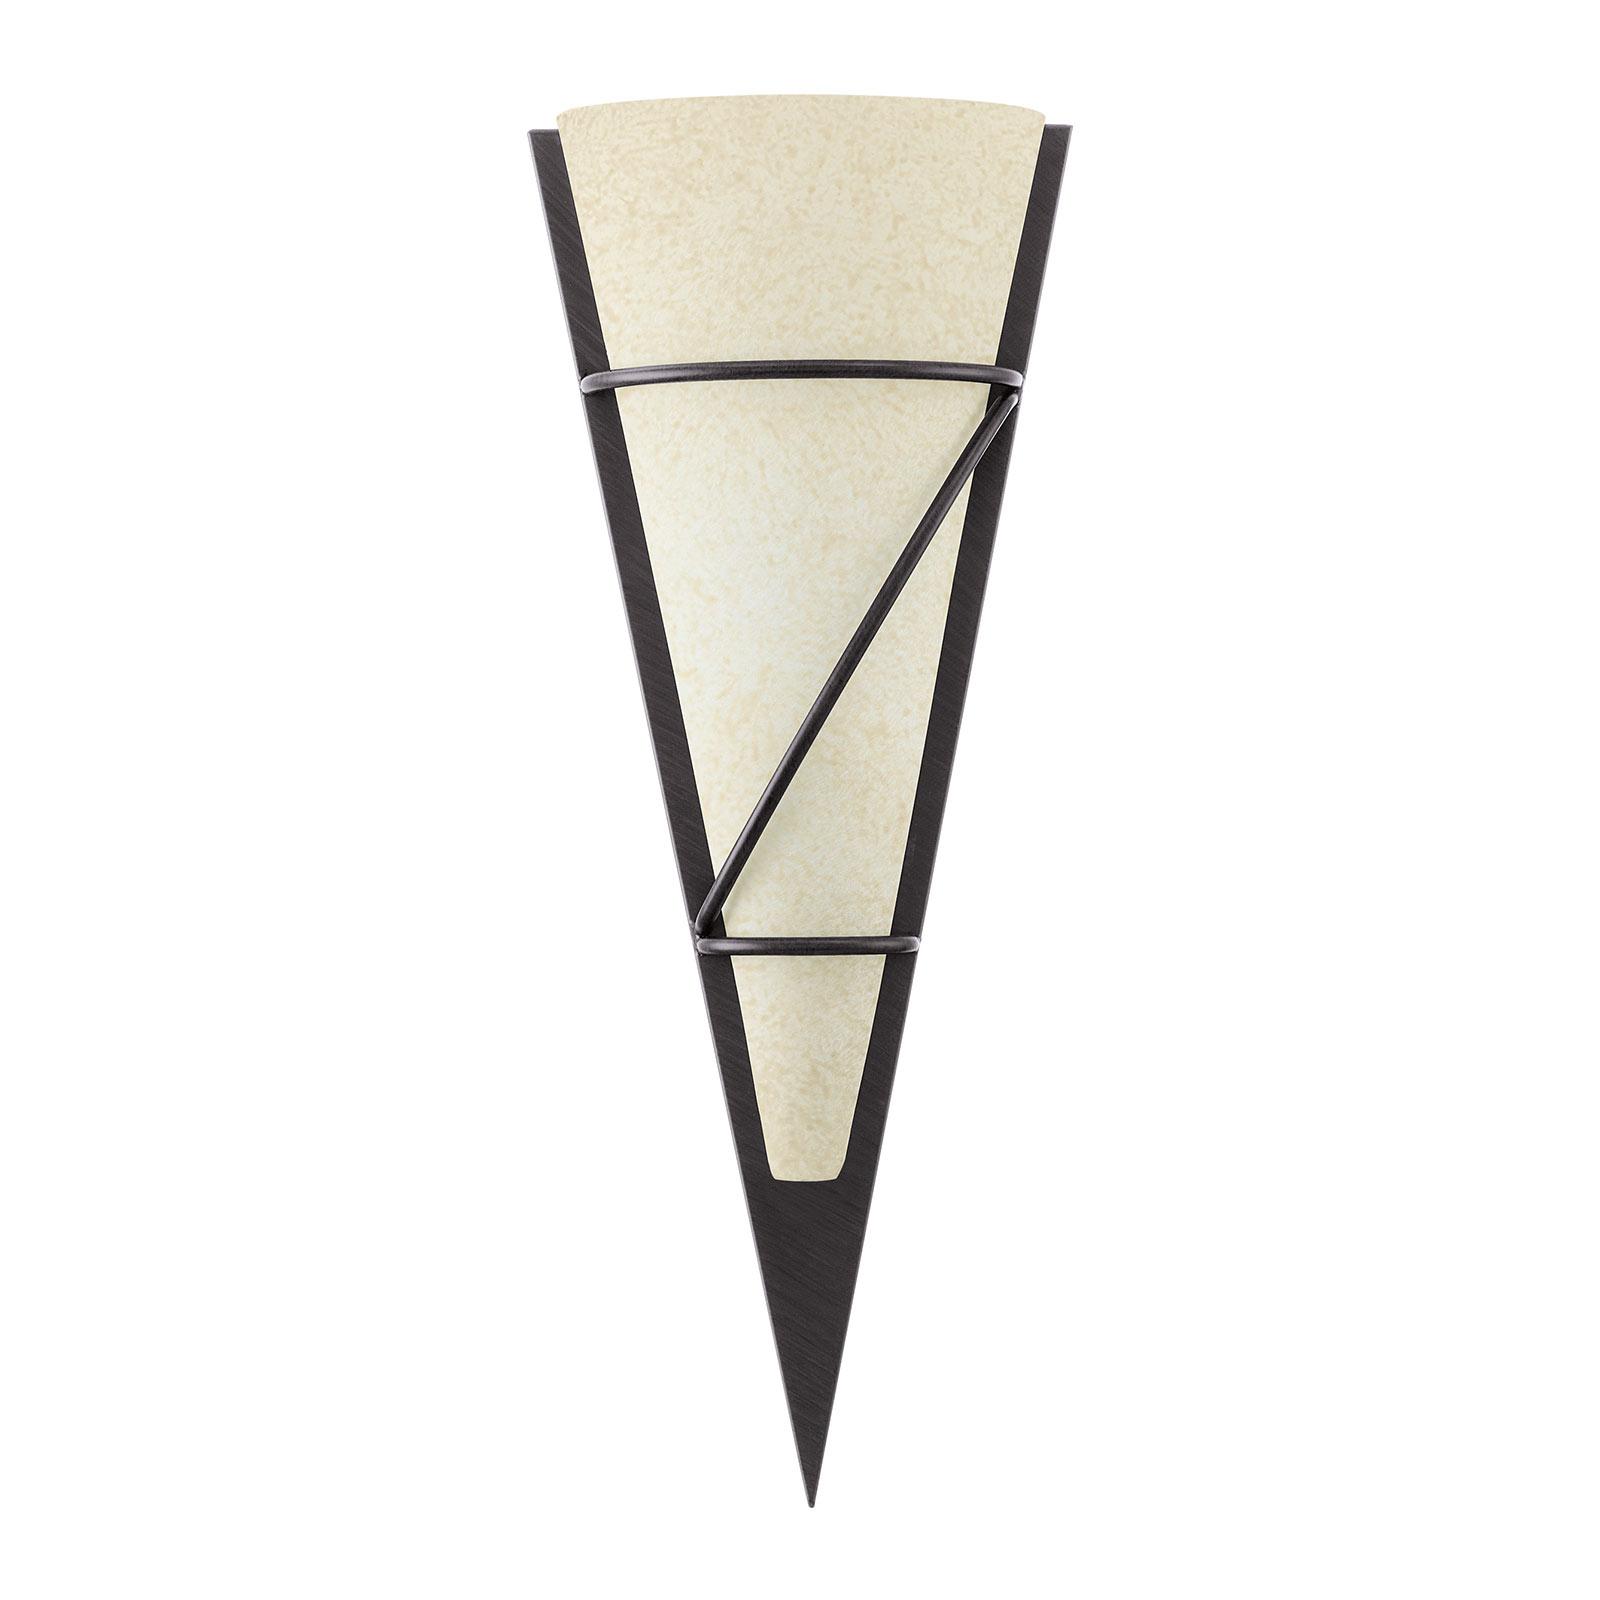 Antik væglampe Pascal 48